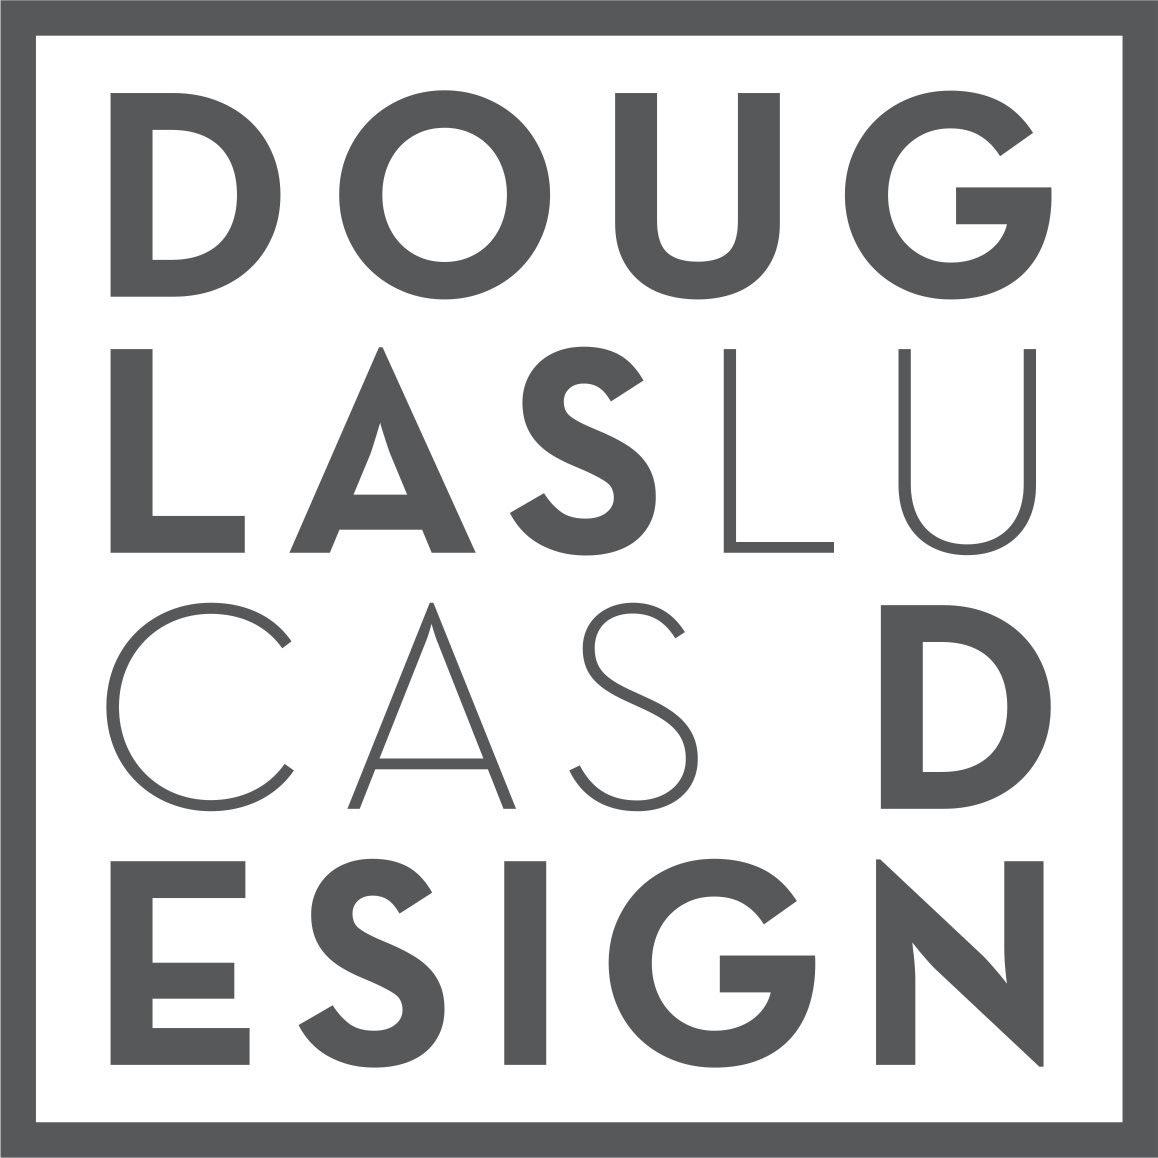 Douglas Lucas